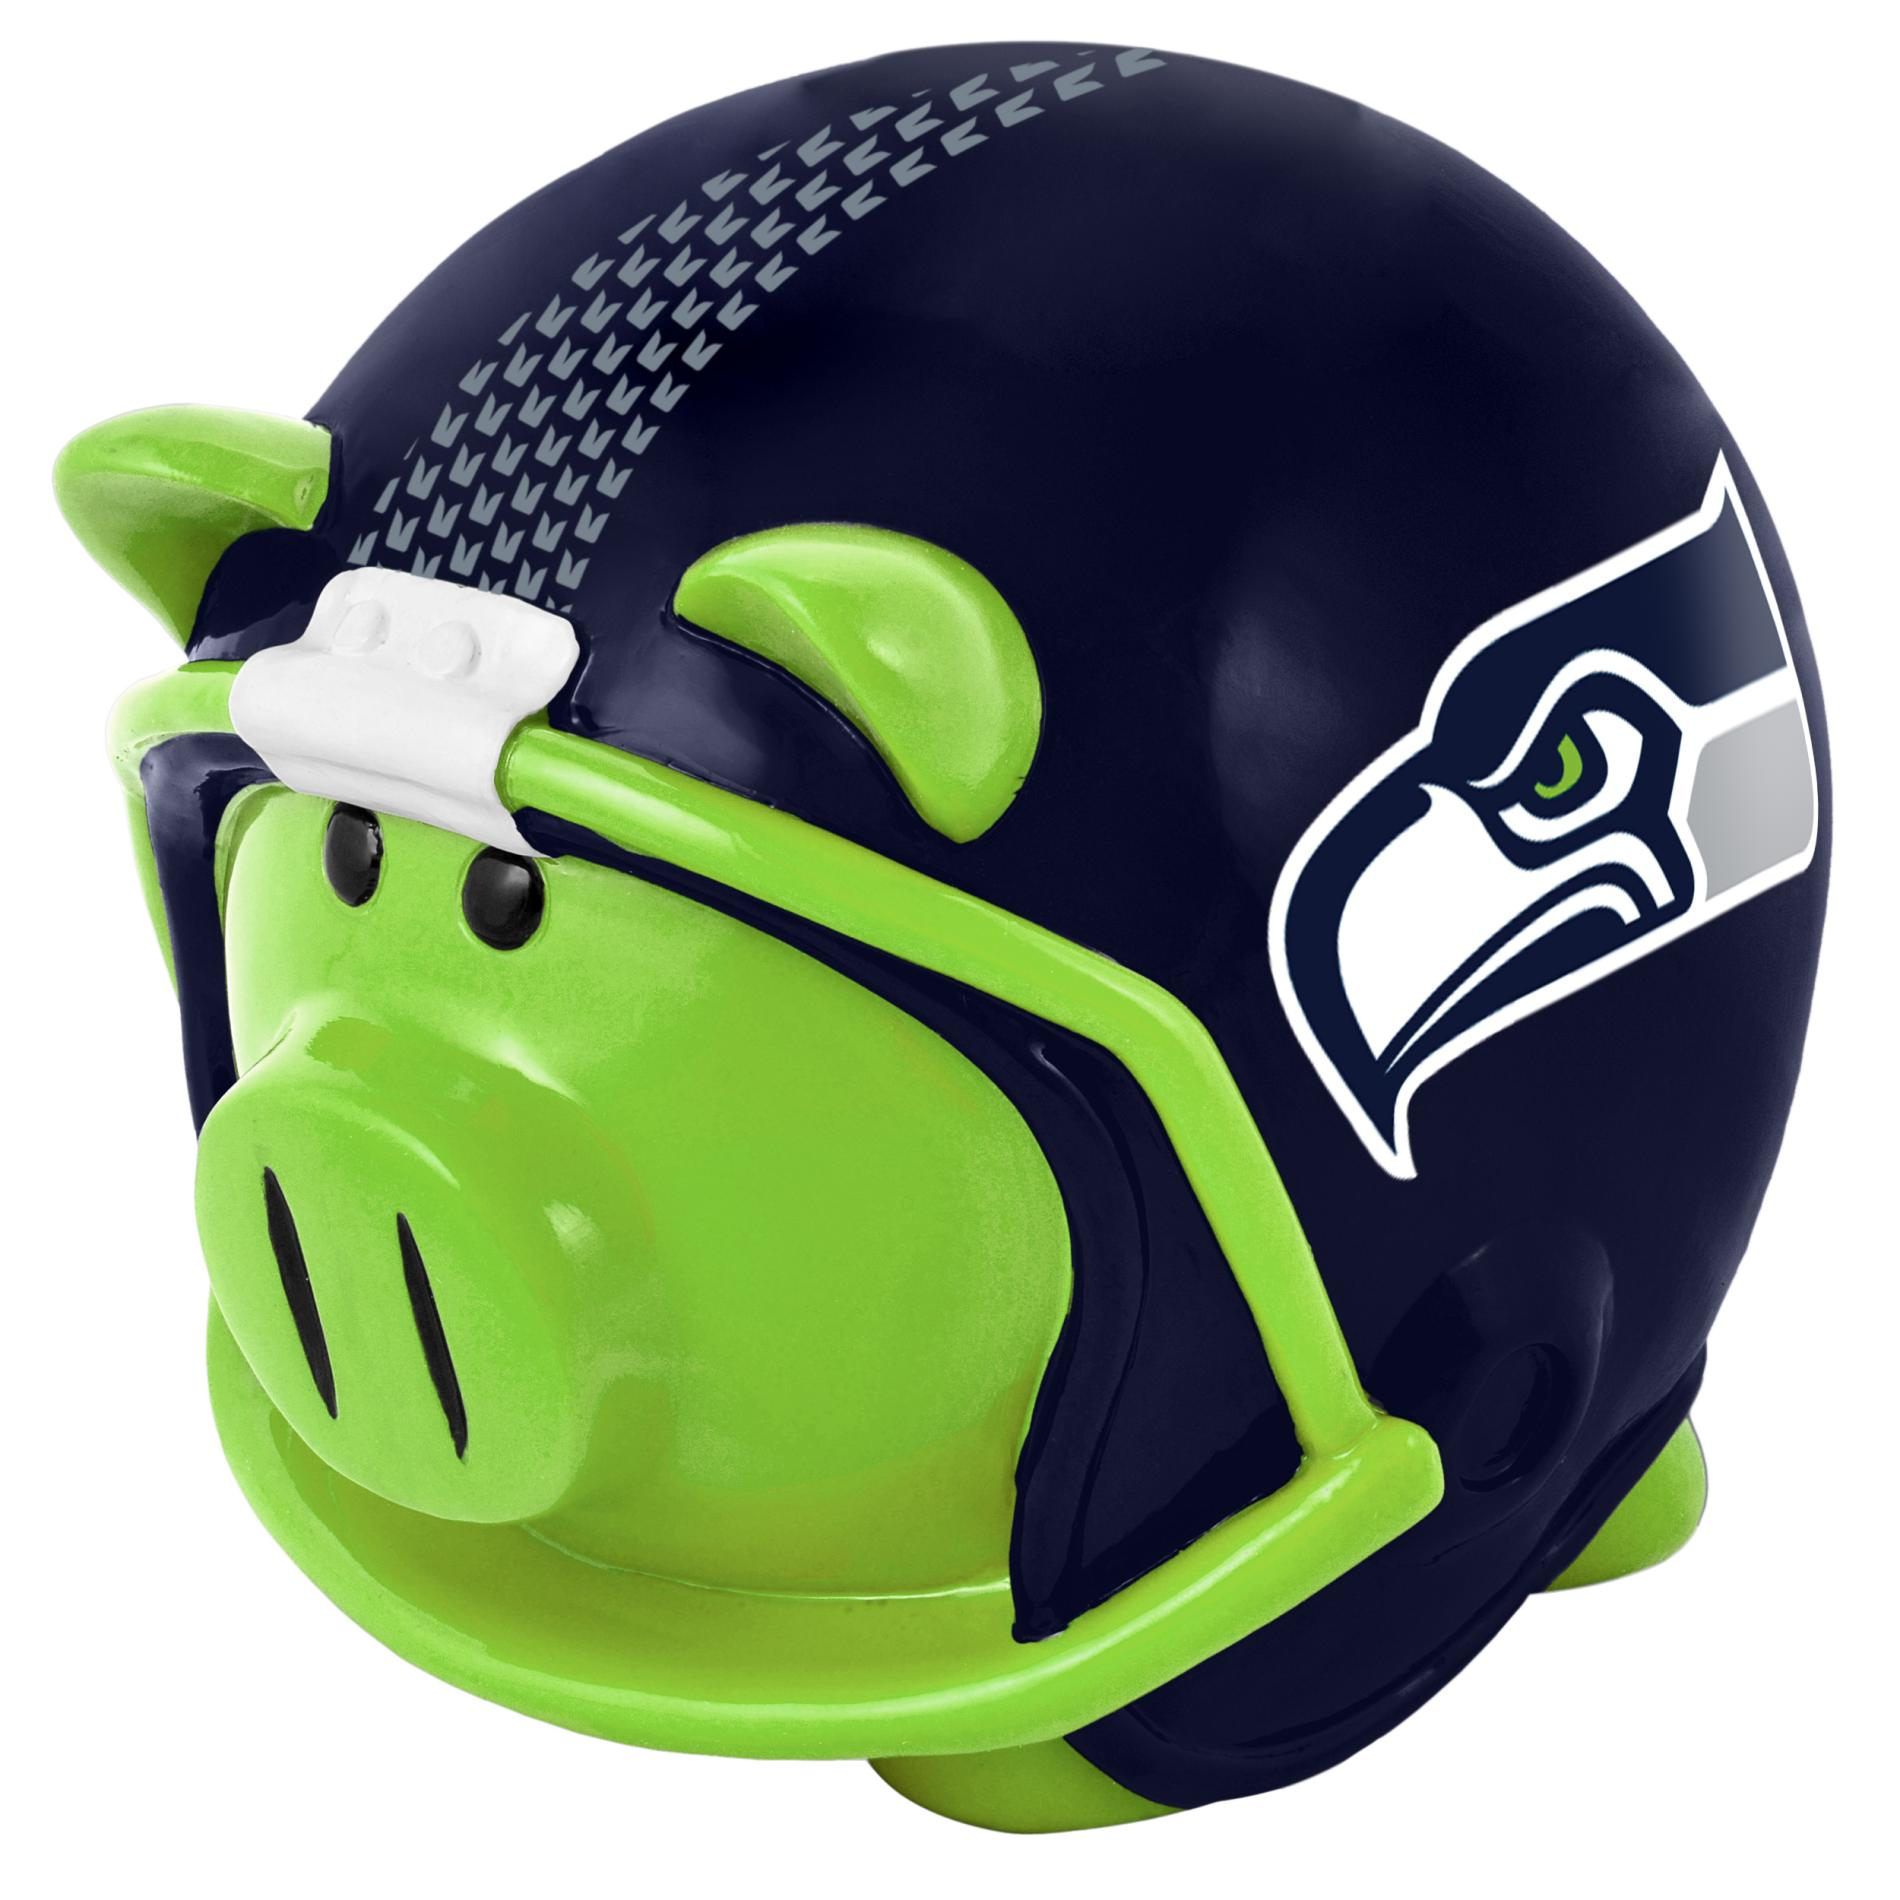 NFL Helmet Piggy Bank Seattle Seahawks